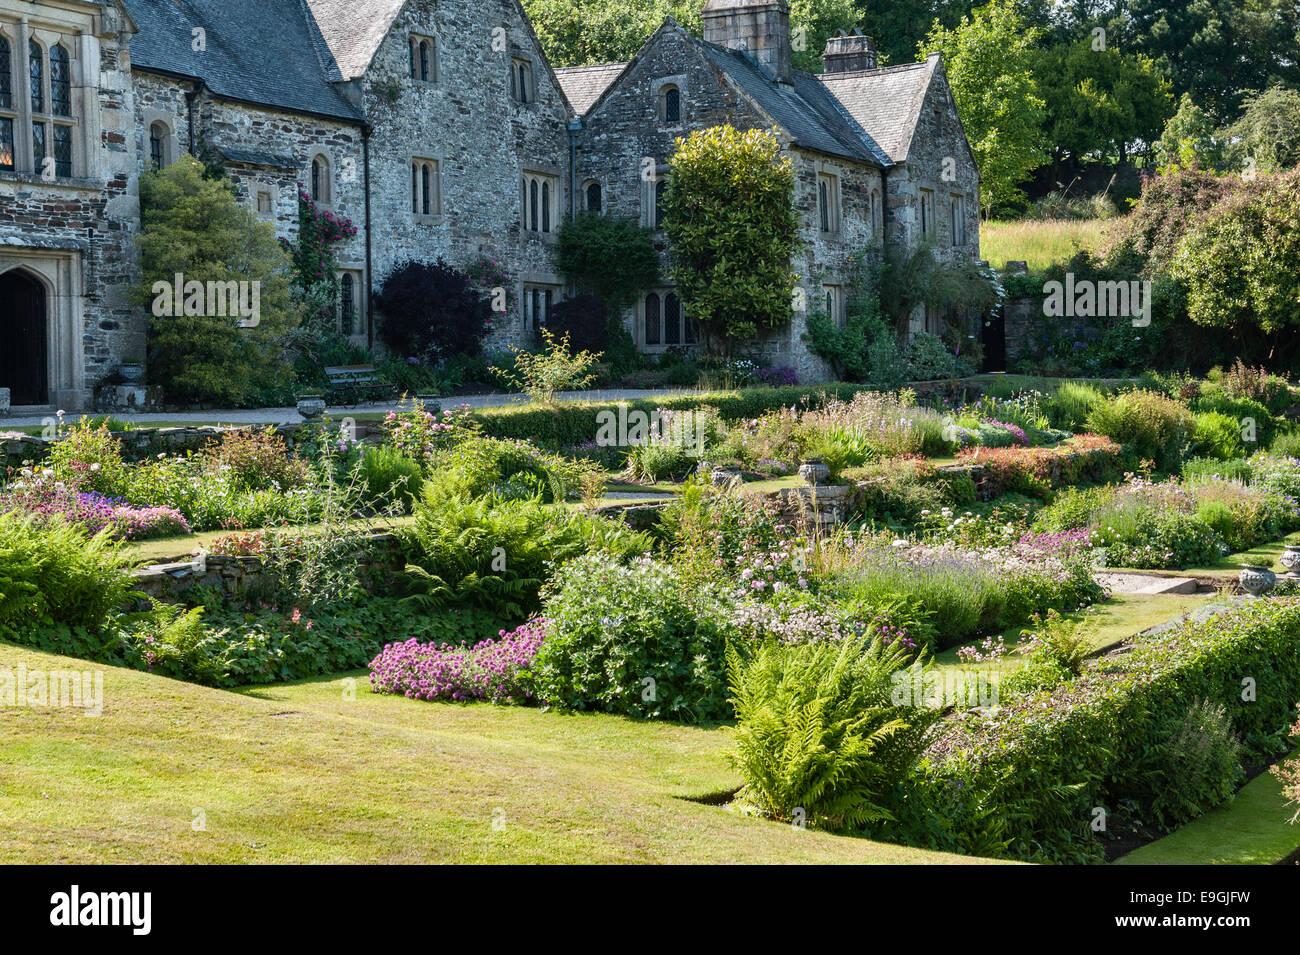 Cotehele, Saltash, Cornwall, UK. The garden terraces in summer - Stock Image